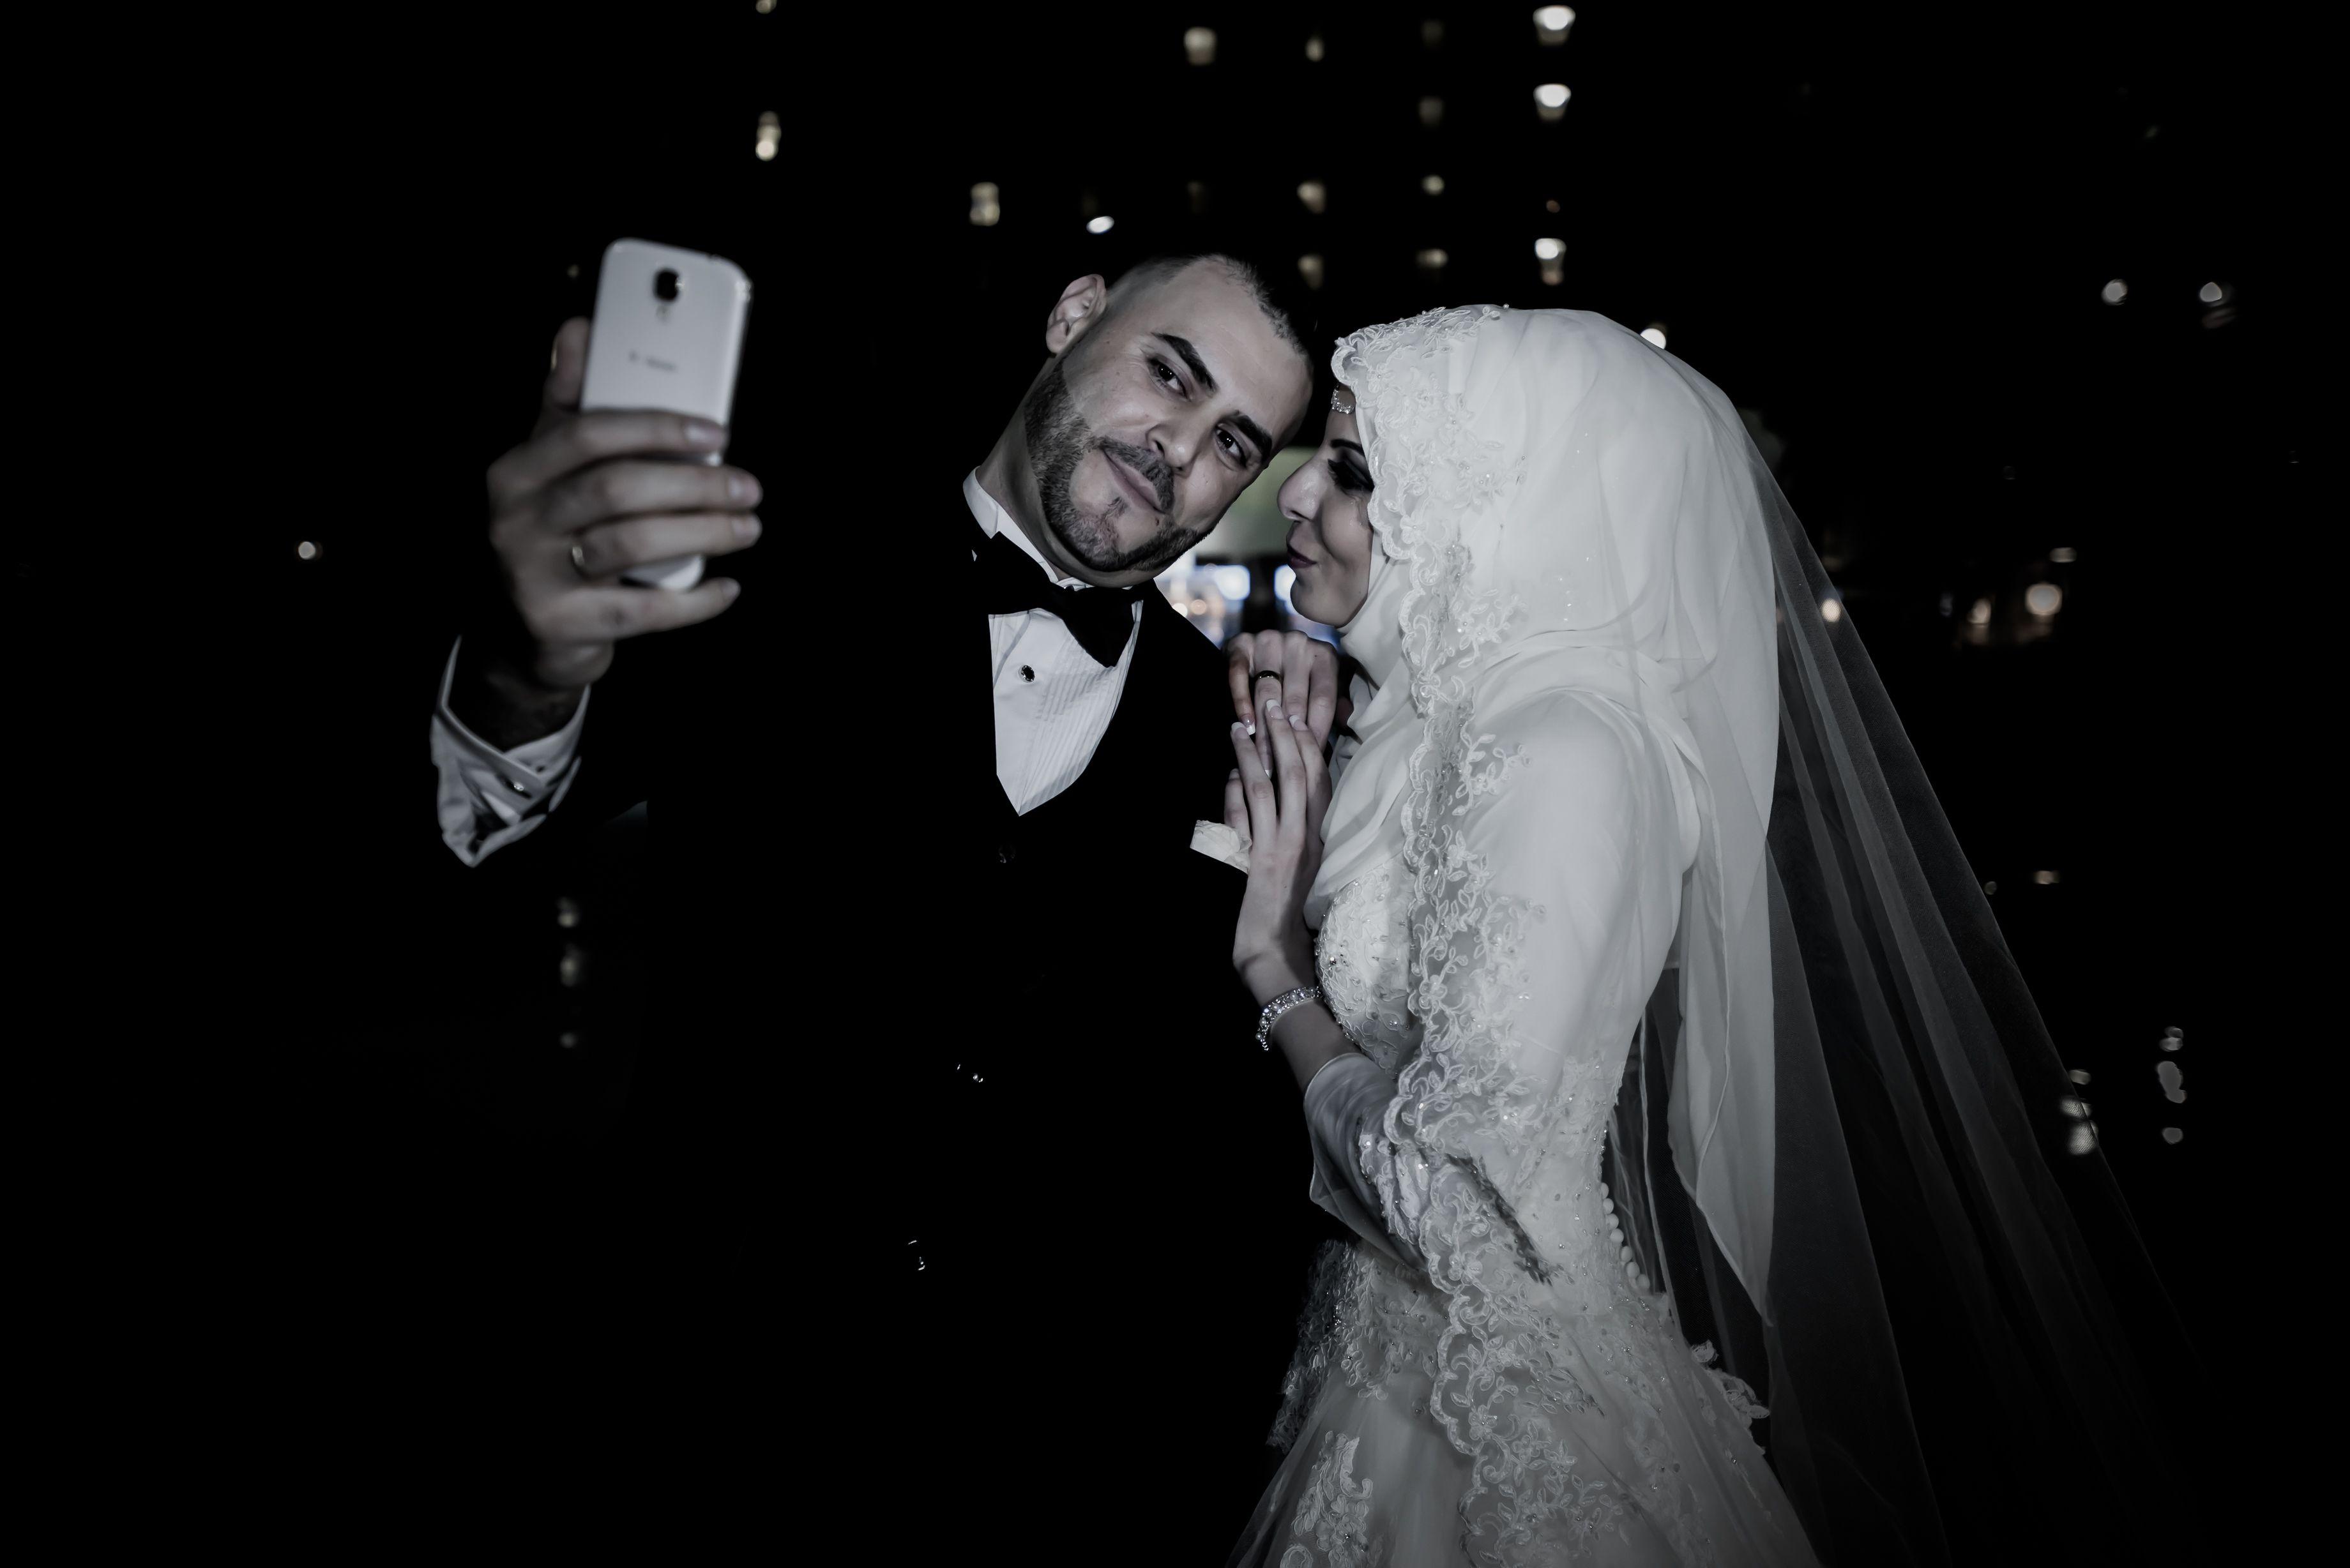 Ipw Reception Corporate Event Photographyorlando Wedding: Orlando Wedding Photographer Www.magnafoto.com Photo Booth